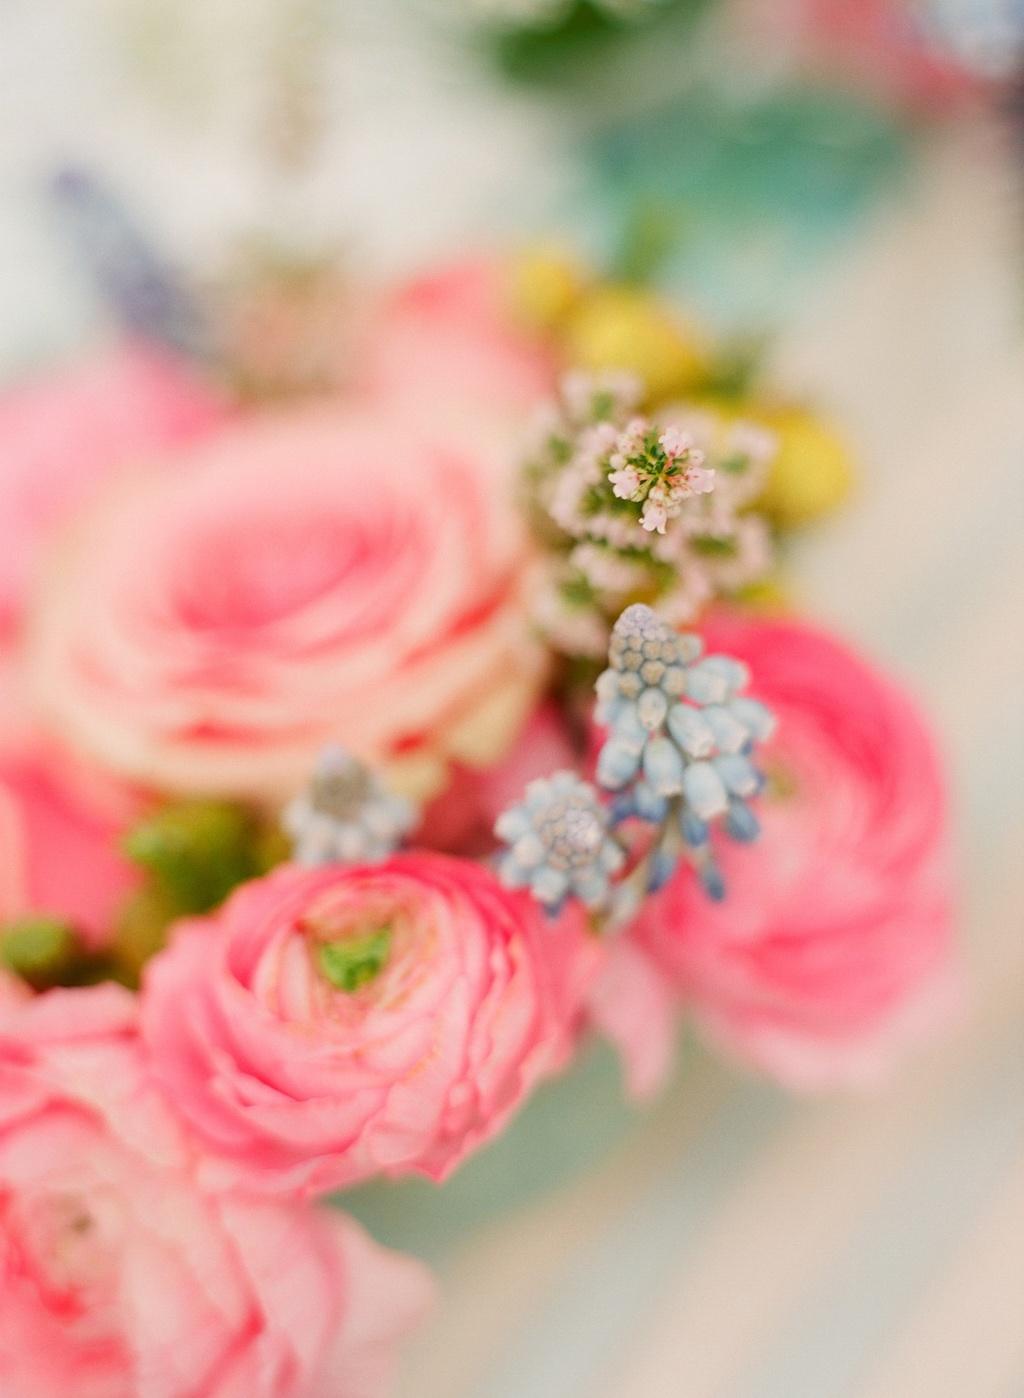 Romantic-wedding-details-outdoor-weddings-pink-ranunculus.full